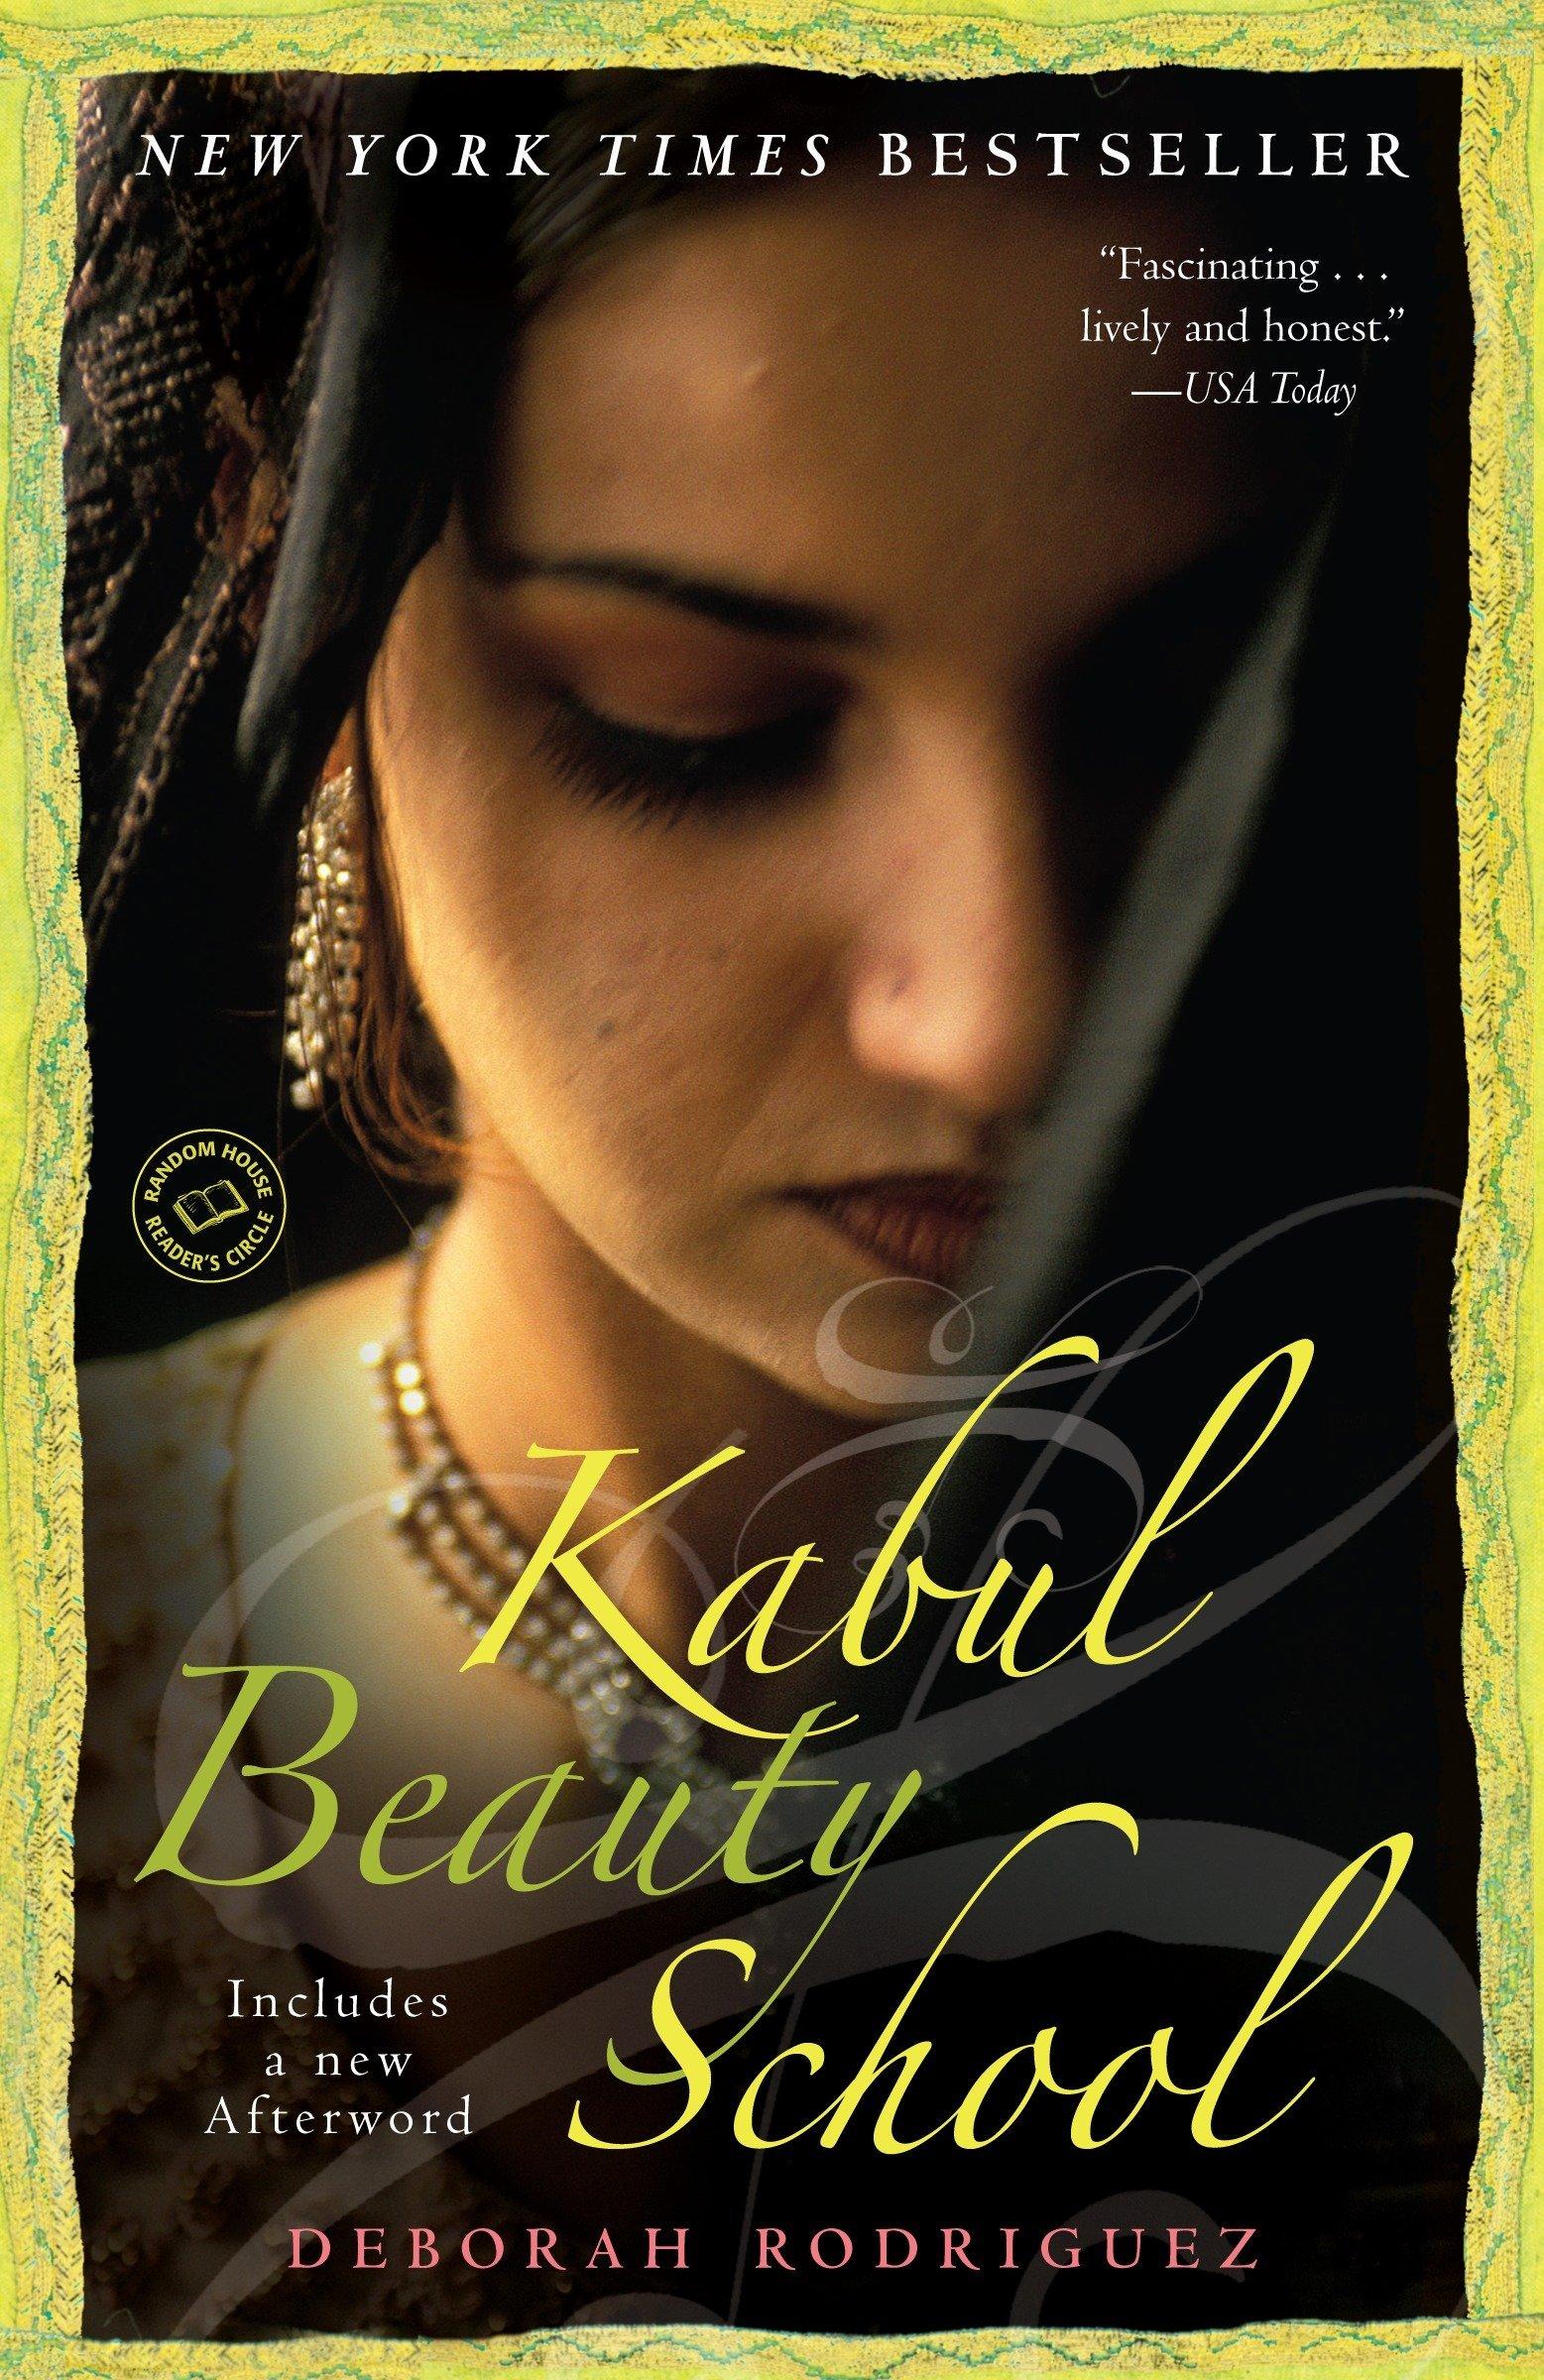 Kabul Beauty School: An American Woman Goes Behind the Veil: Deborah  Rodriguez, Kristin Ohlson: 9780812976731: Amazon.com: Books